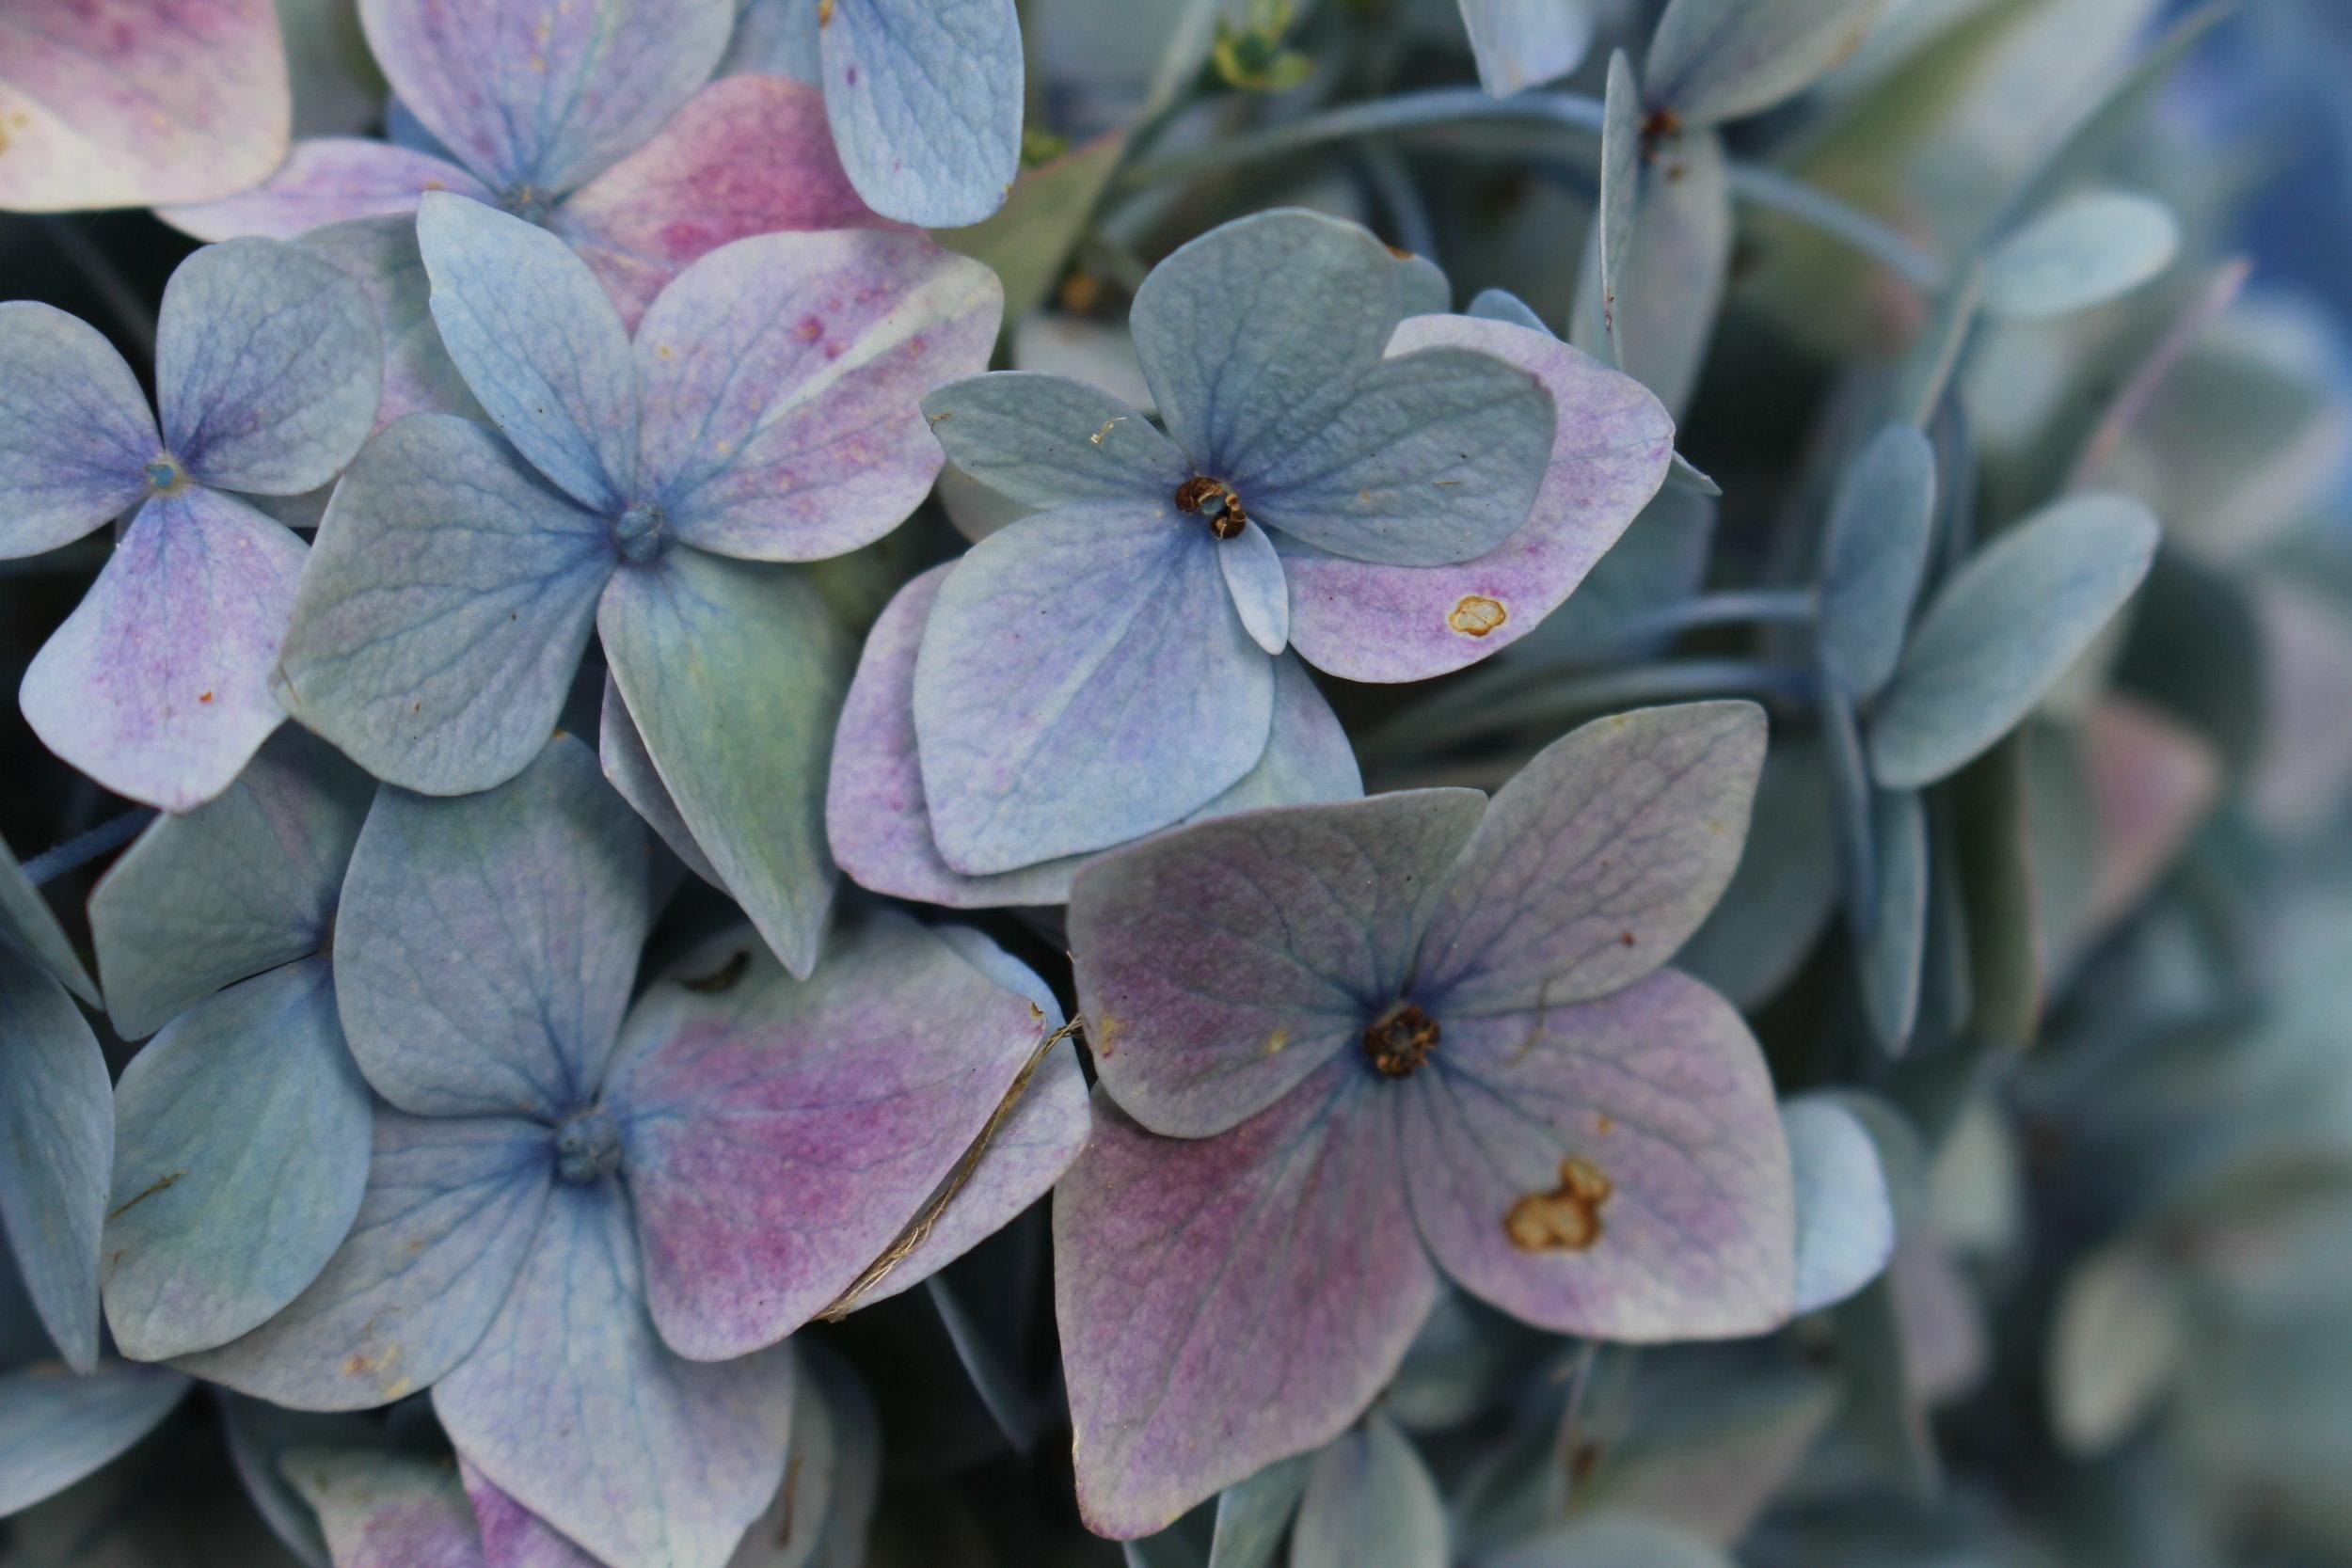 #104 Hydrangea, Hydrangea macrophylla